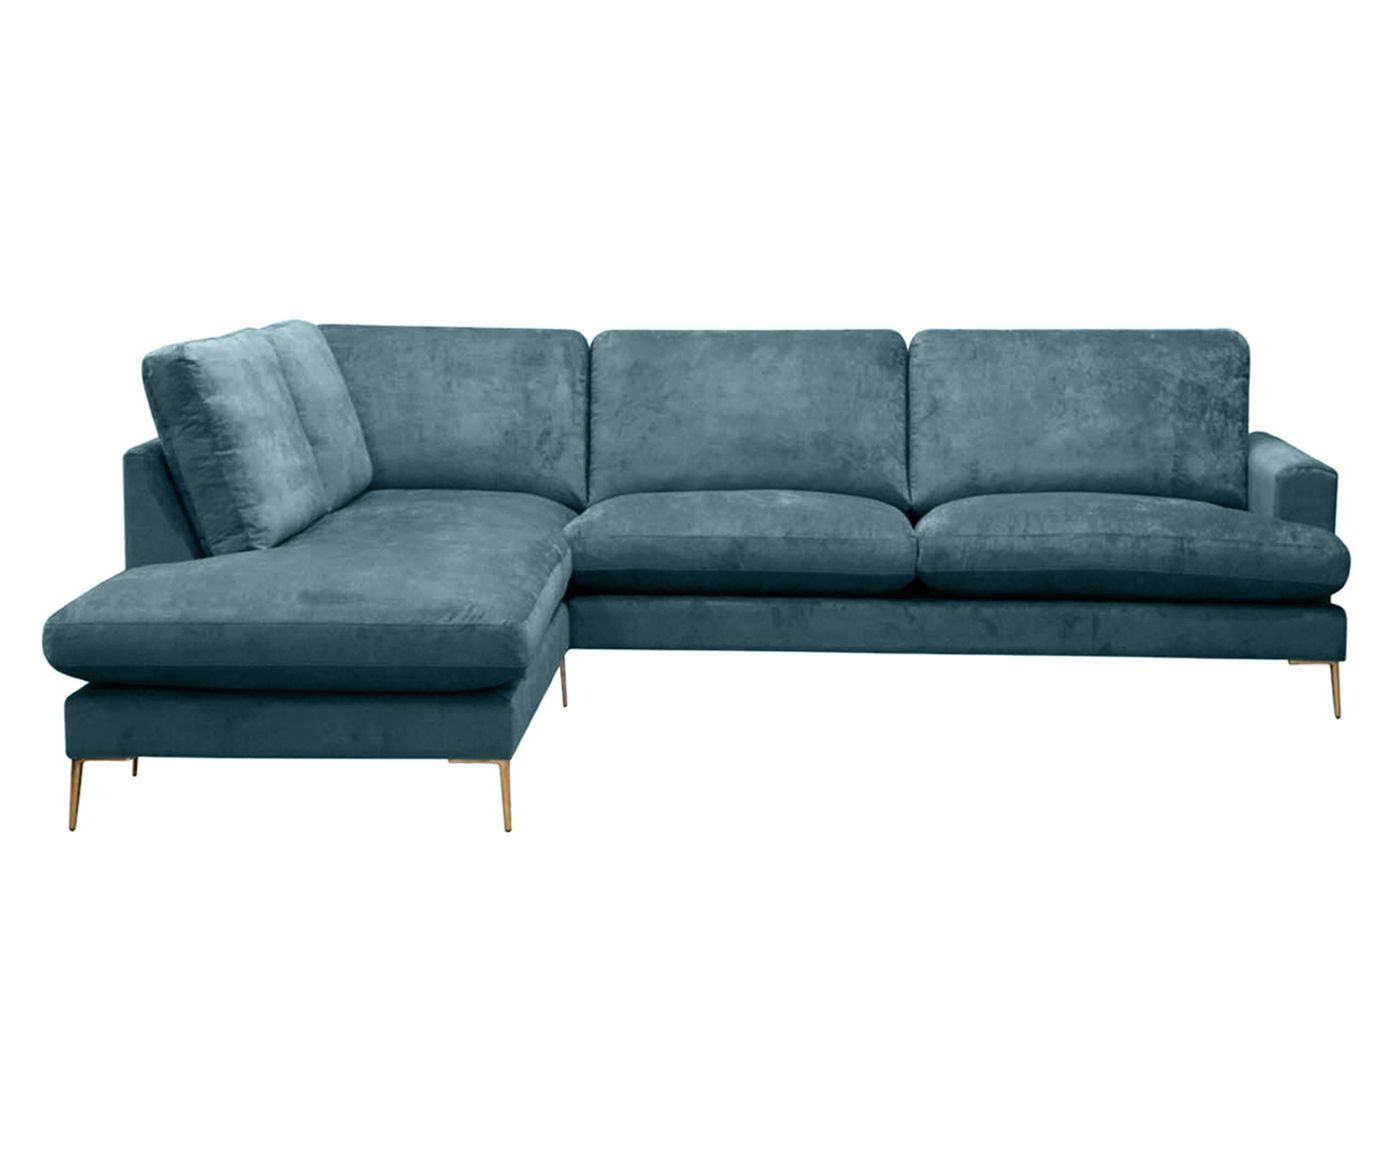 Super-Stoff Samt Glanz für edle Moderne | Westwing Home ...